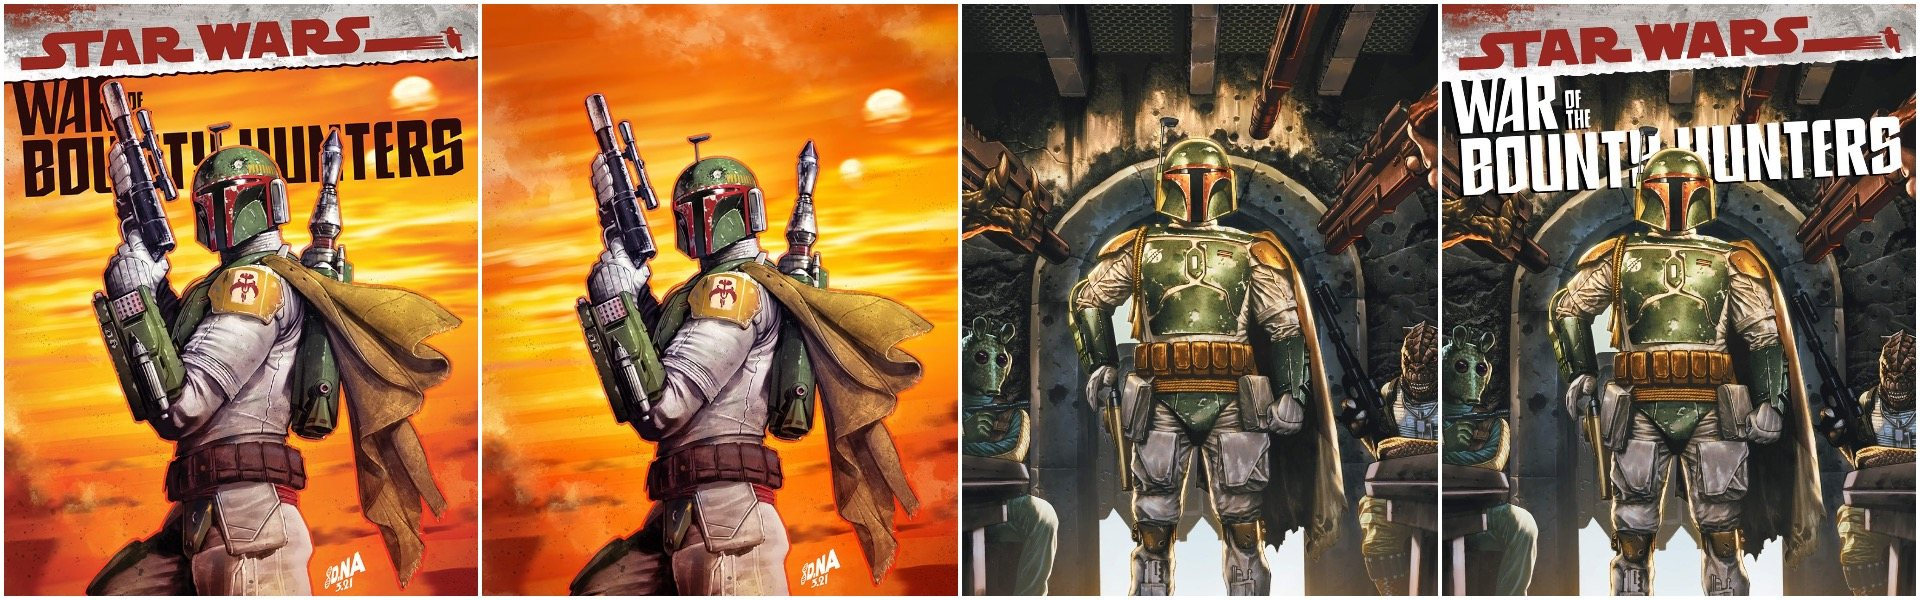 Star Wars War of the Bounty Hunters Alpha #1 David Nakayama and Mico Suayan Variants